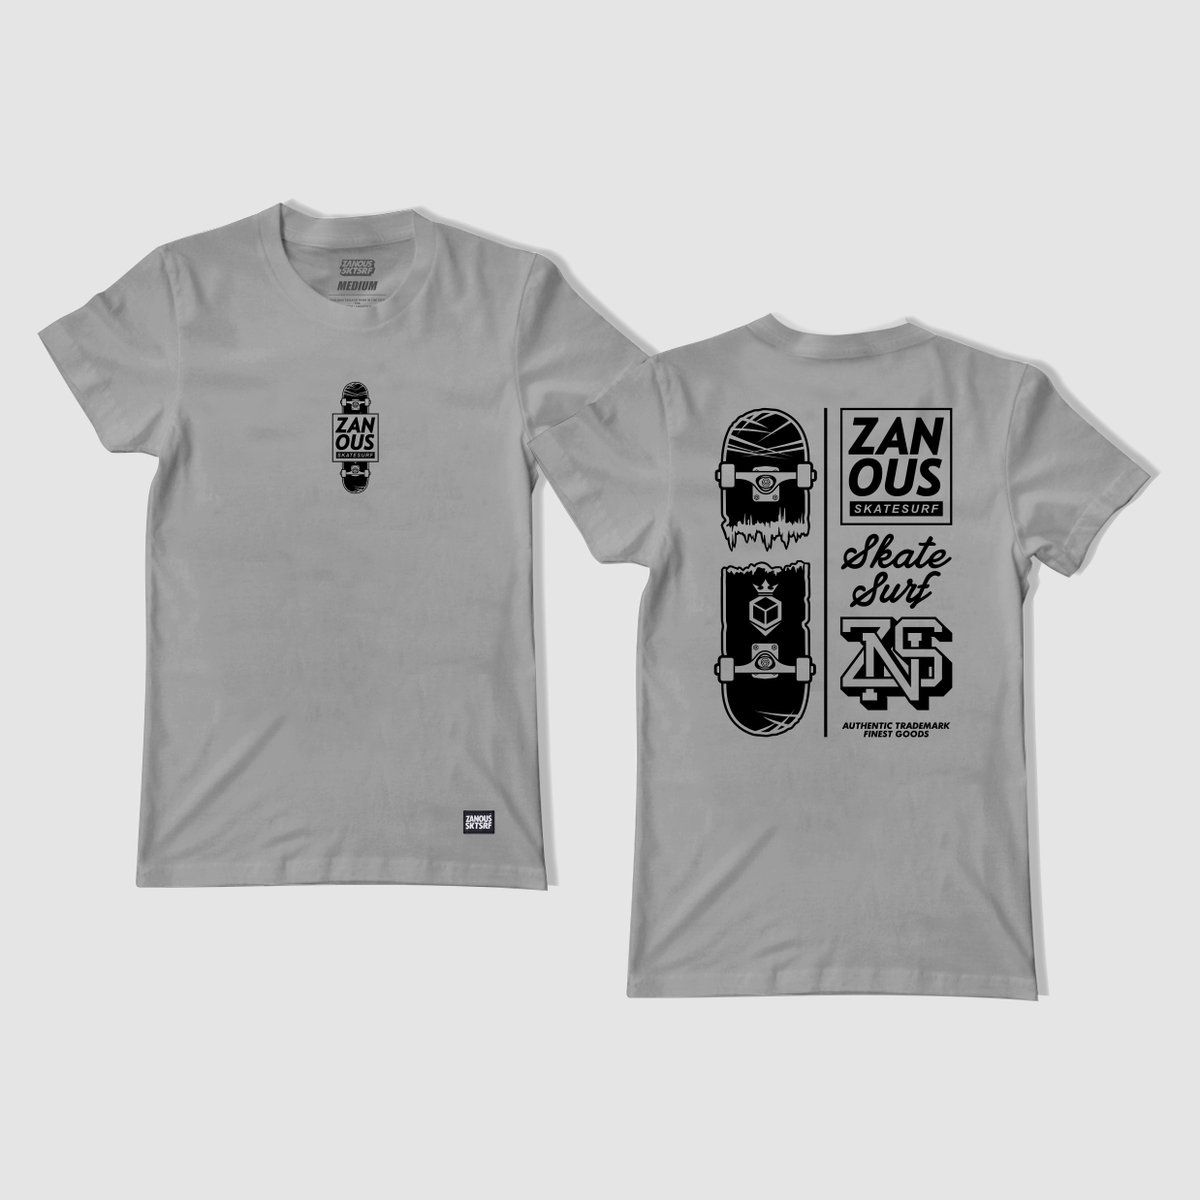 T-Shirt. Material : Cotton 30s Price : 125.000 . For order please contact : Wa : 082214180880 Shopee : Zuldazanous #zanousgangs #distrobandung #fashion #ootd #pants #skate #surf #jakarta #makasar #jepara #kuduspic.twitter.com/eIekx0gGtw